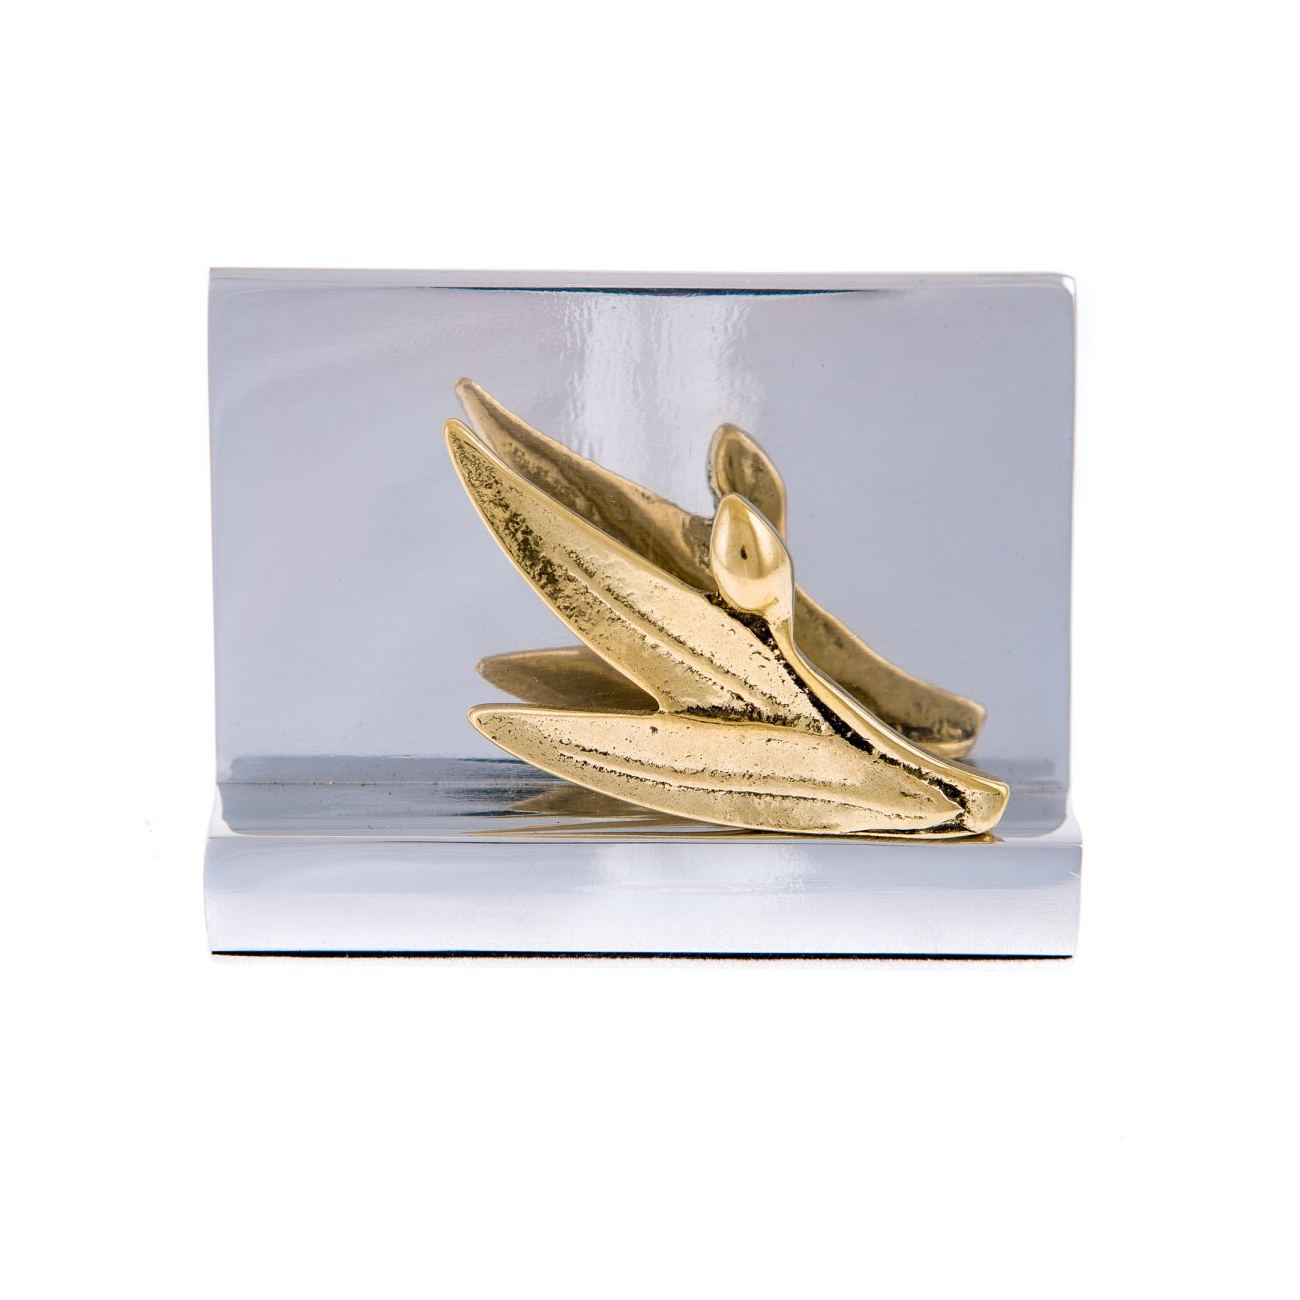 Business card holder handmade solid metal desk accessory golden business card holder handmade solid metal desk accessory golden olive branch design colourmoves